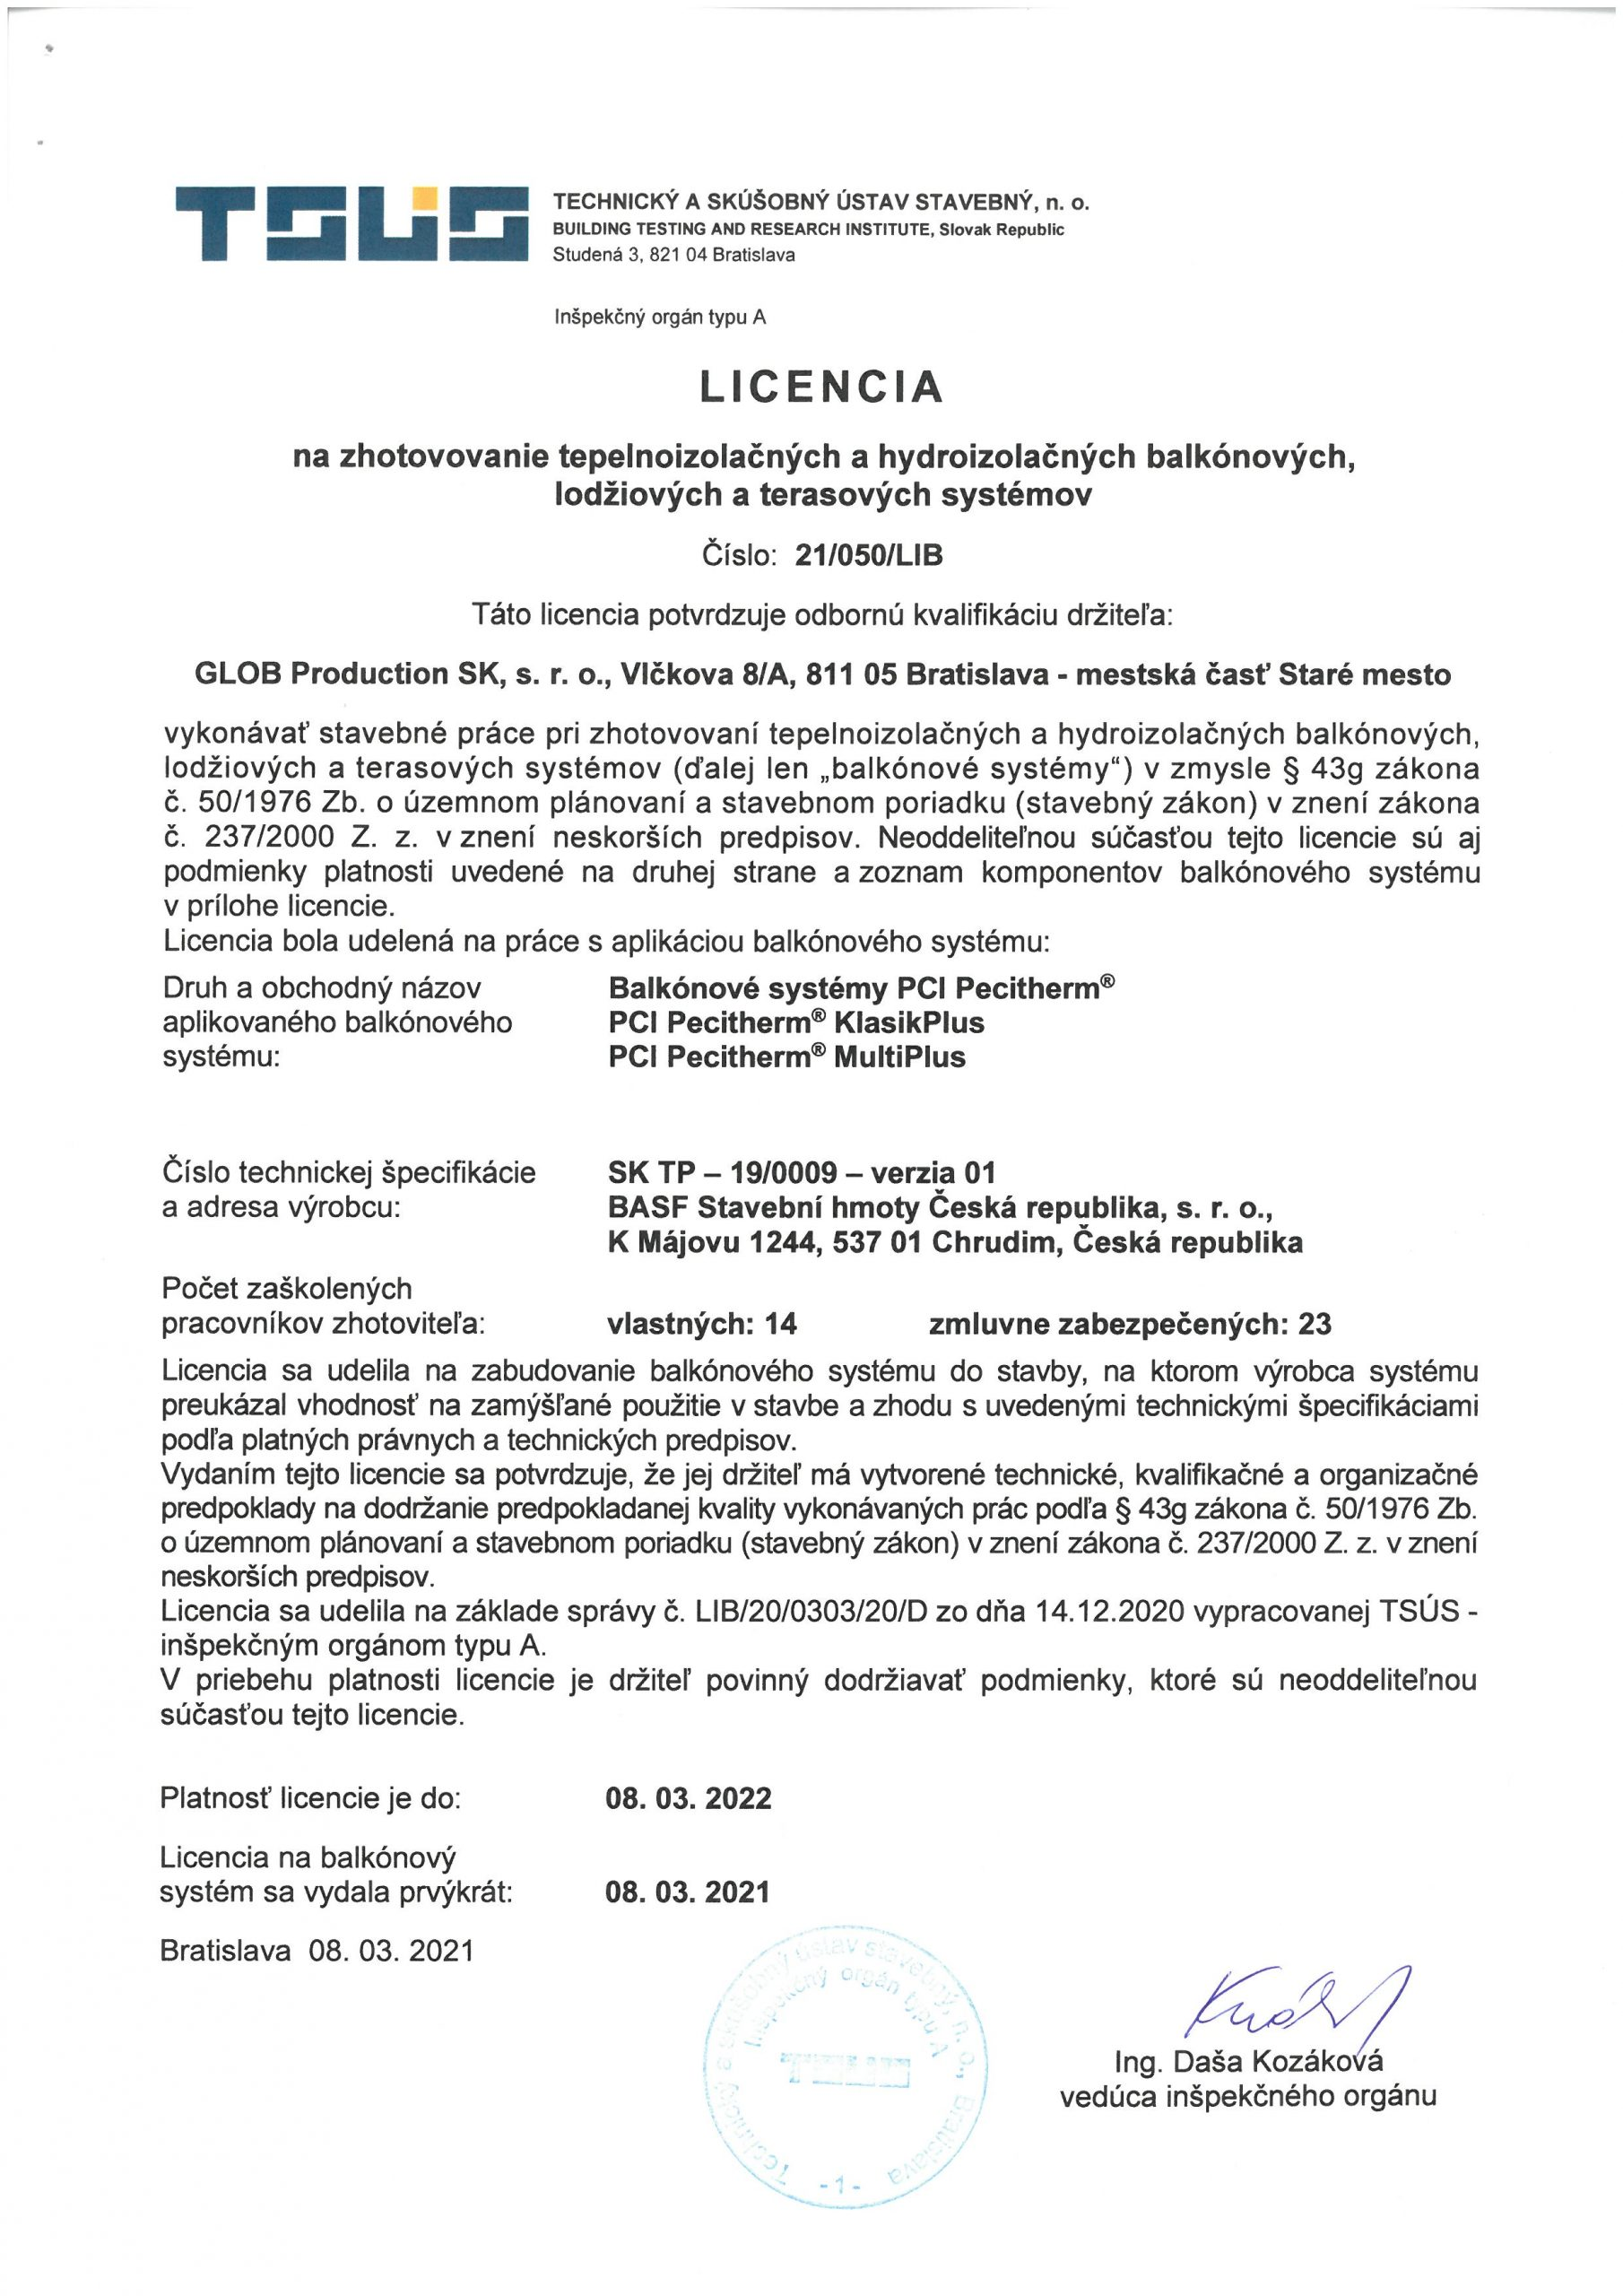 TSUS - Licencia PCI Pecitherm